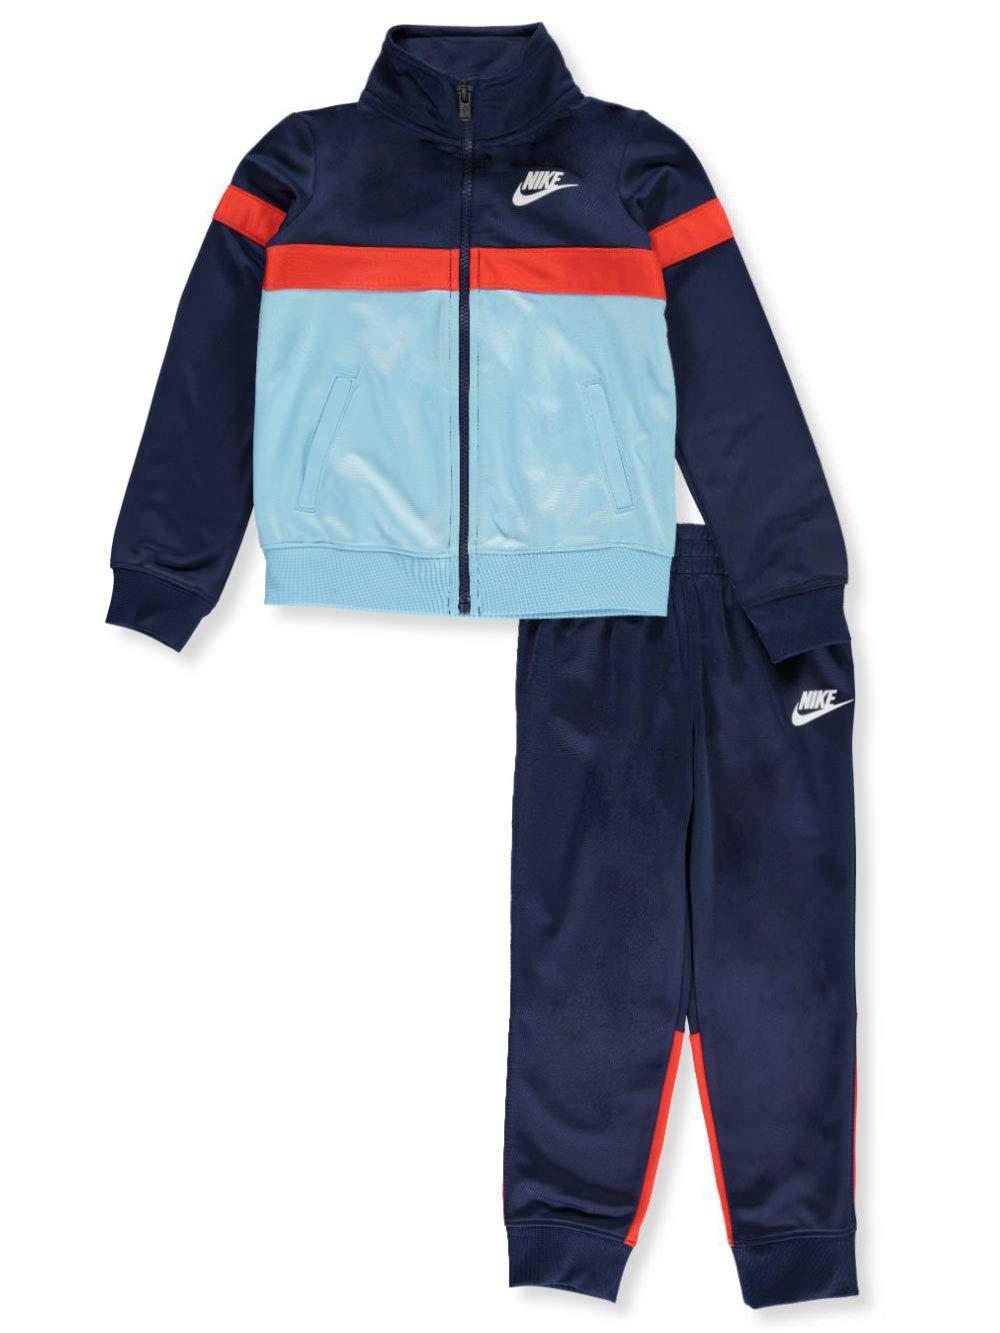 Nike Boys' 2-Piece Tracksuit - Blue Void, 2t